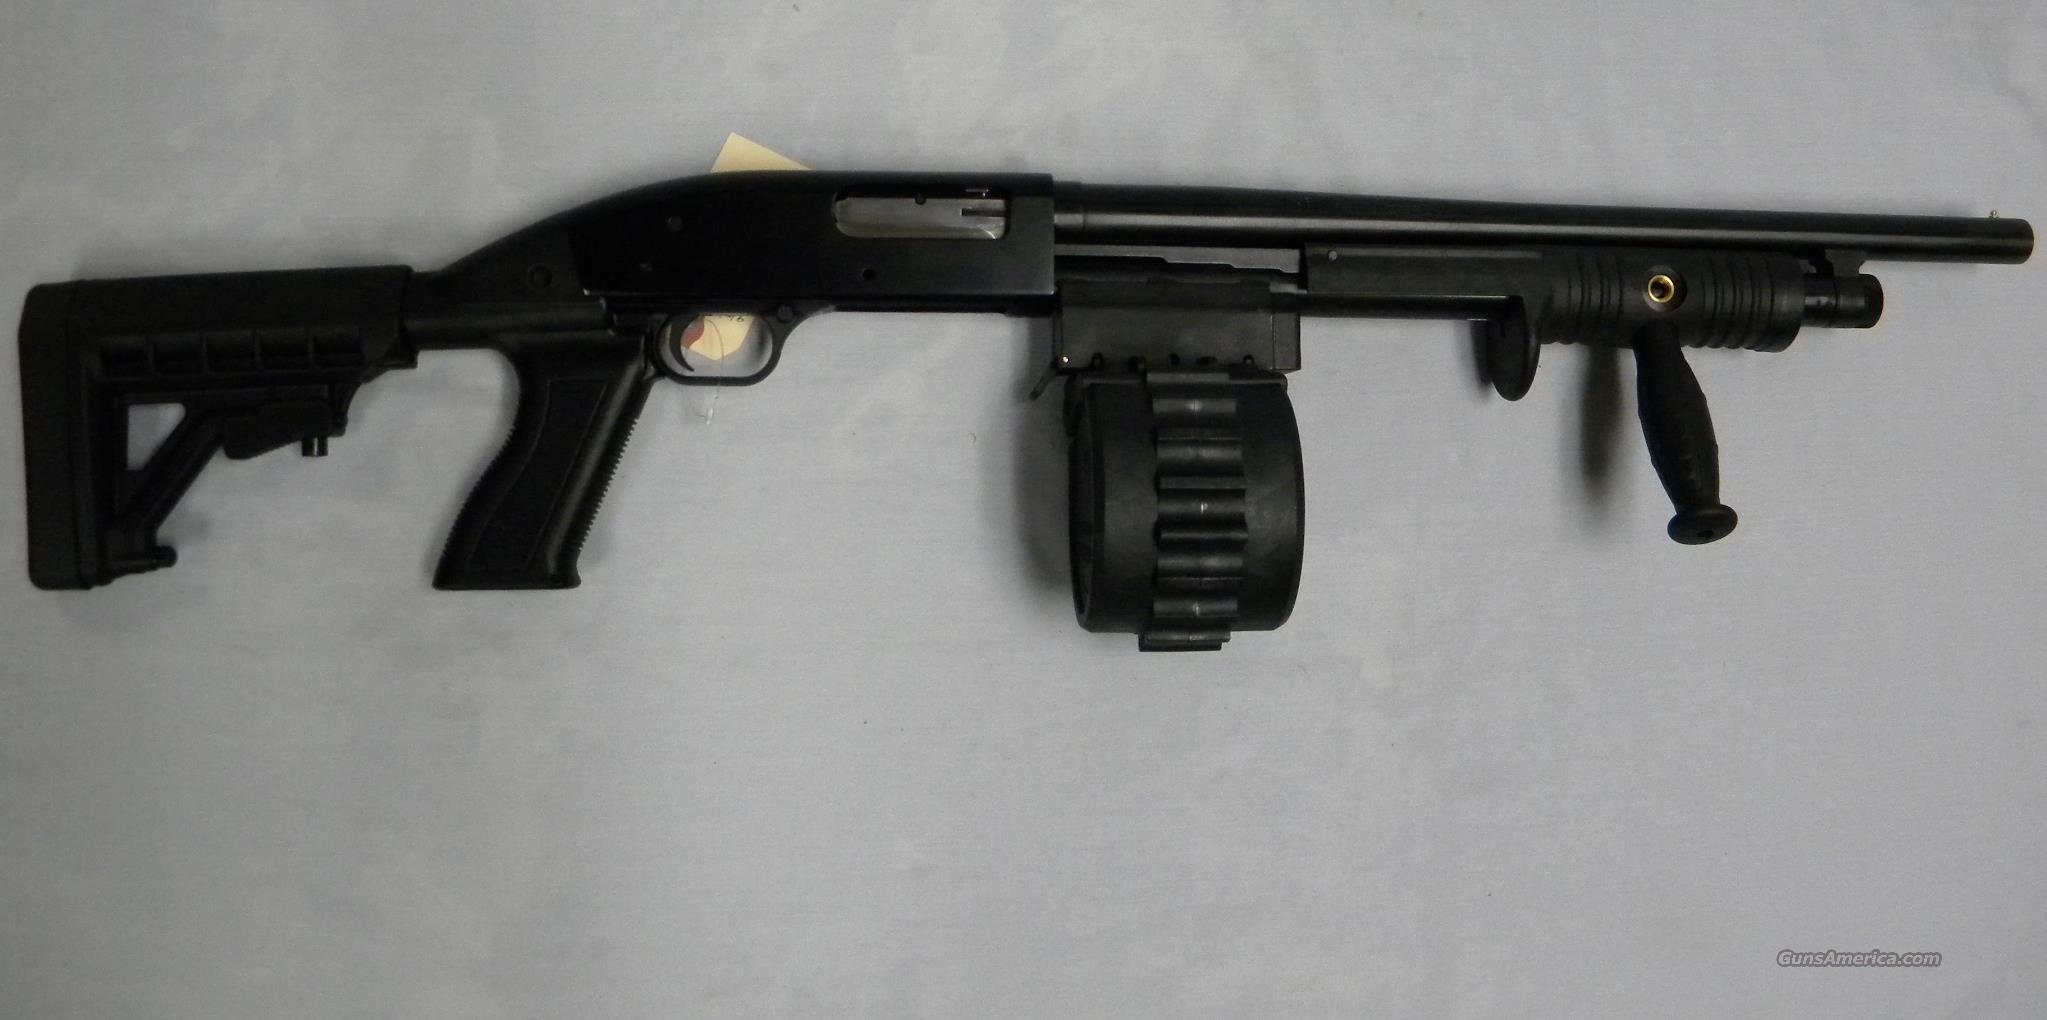 Adaptive Tactical 'Sidewinder Venom' 12 Ga Pump, Maverick 88 Shotgun  Guns > Shotguns > Maverick Shotguns